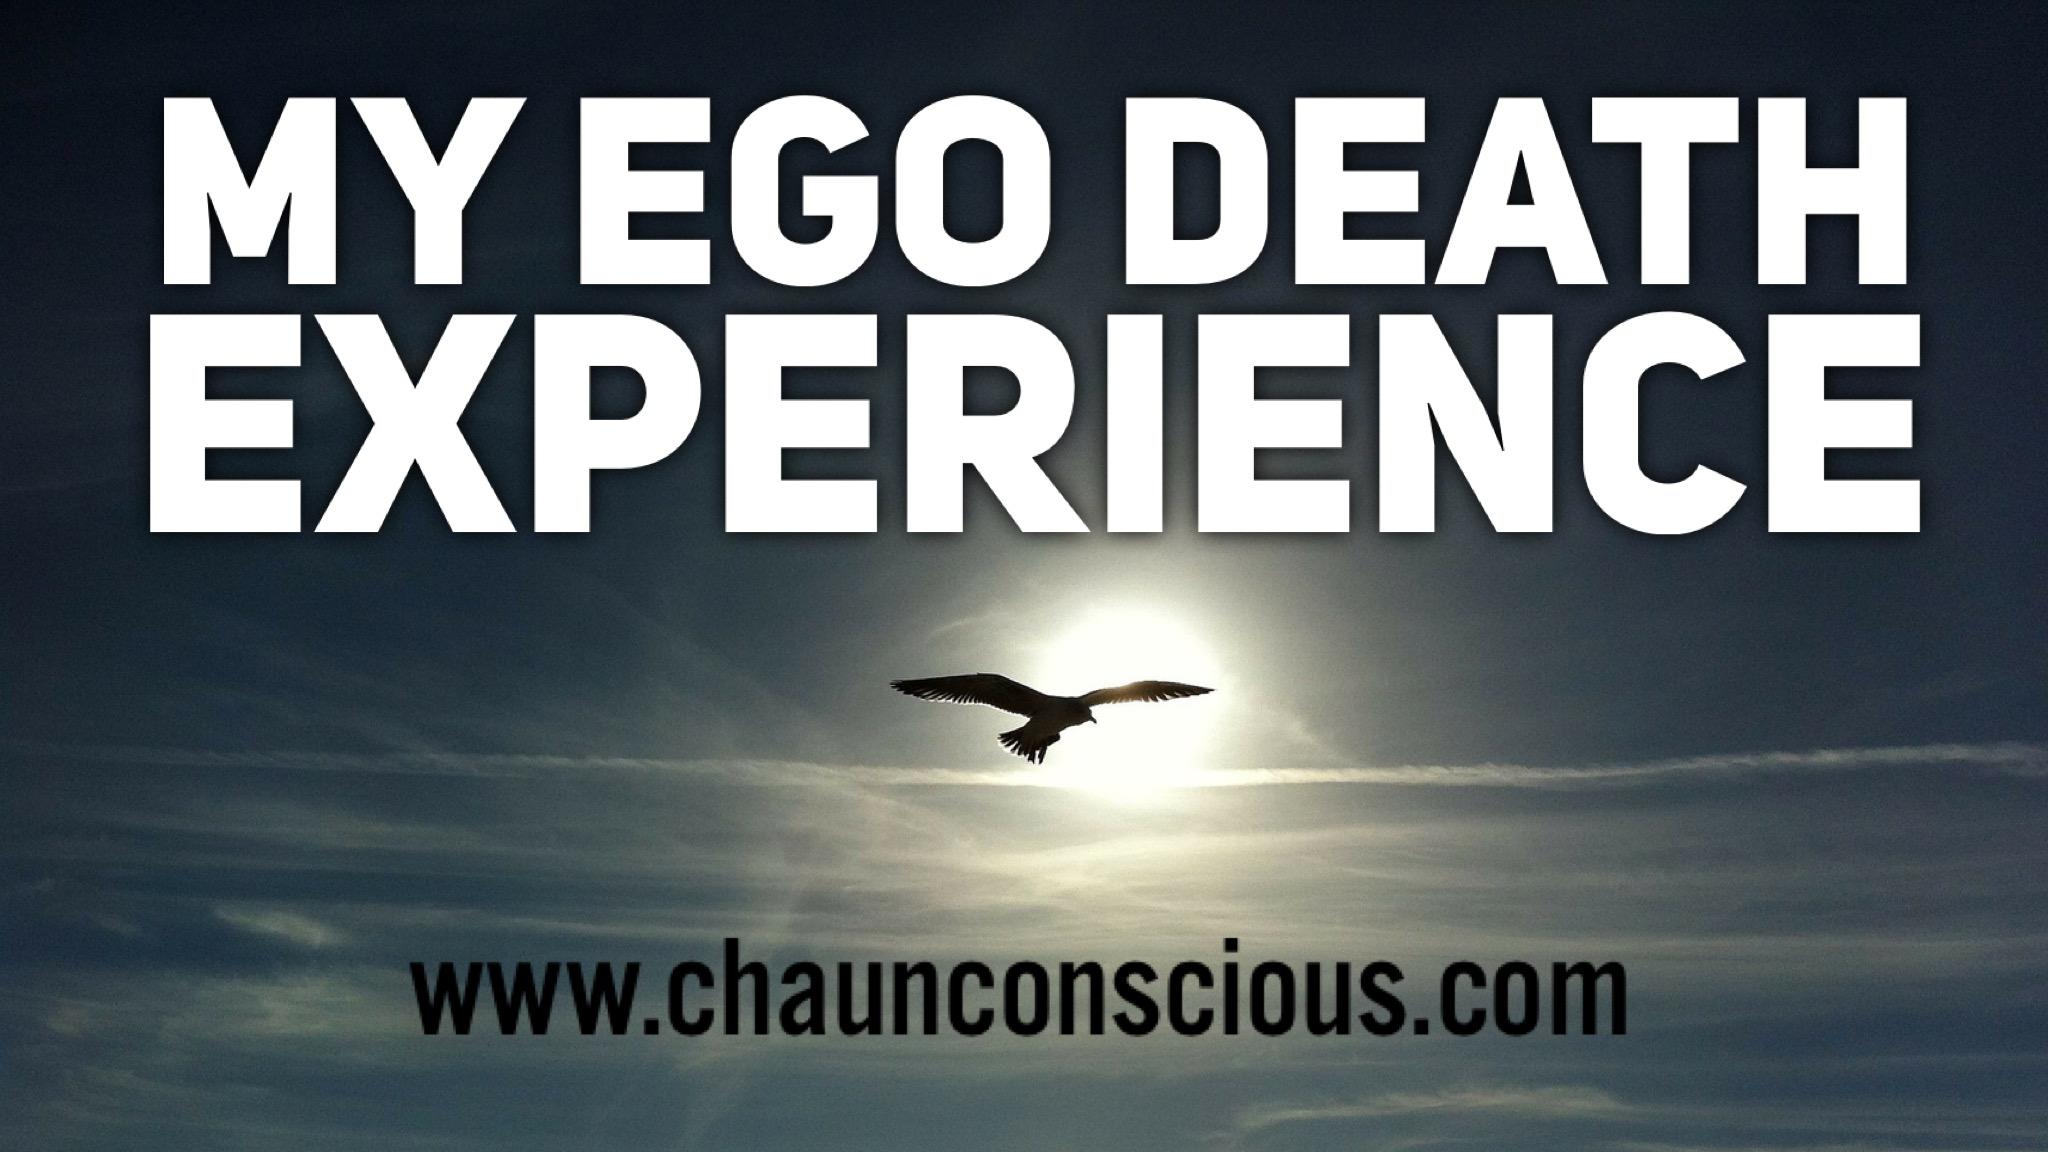 My ego death experience